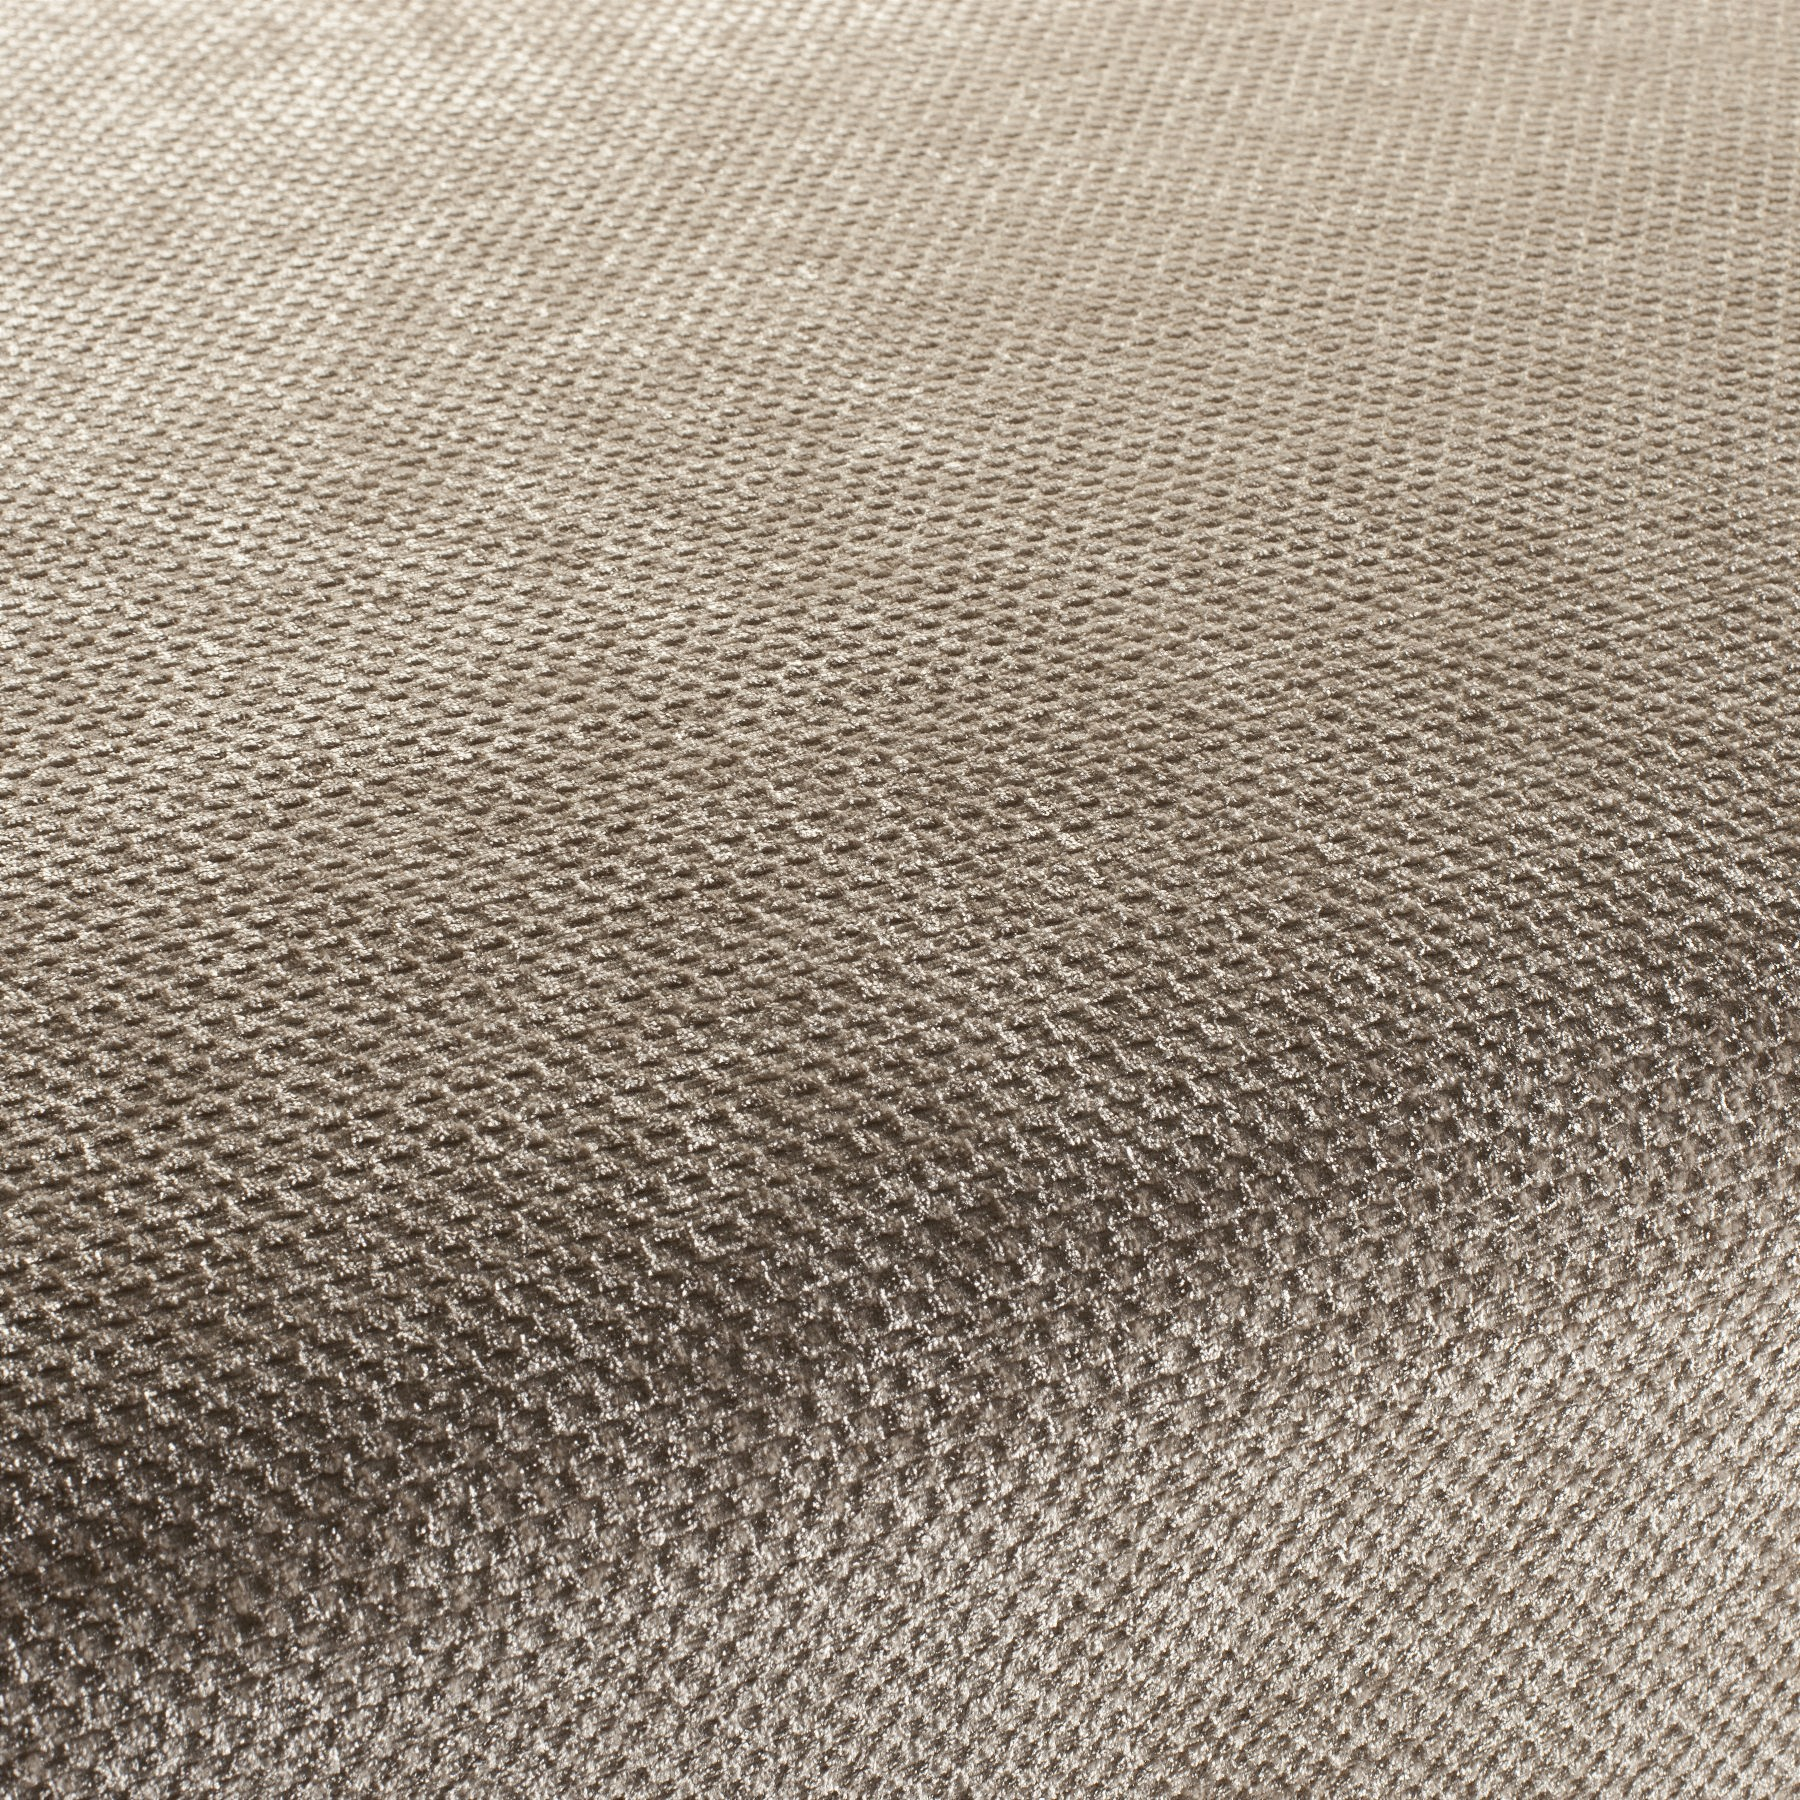 Upholstery Fabric Gavin 1 1327 071 Jab Anstoetz Fabrics